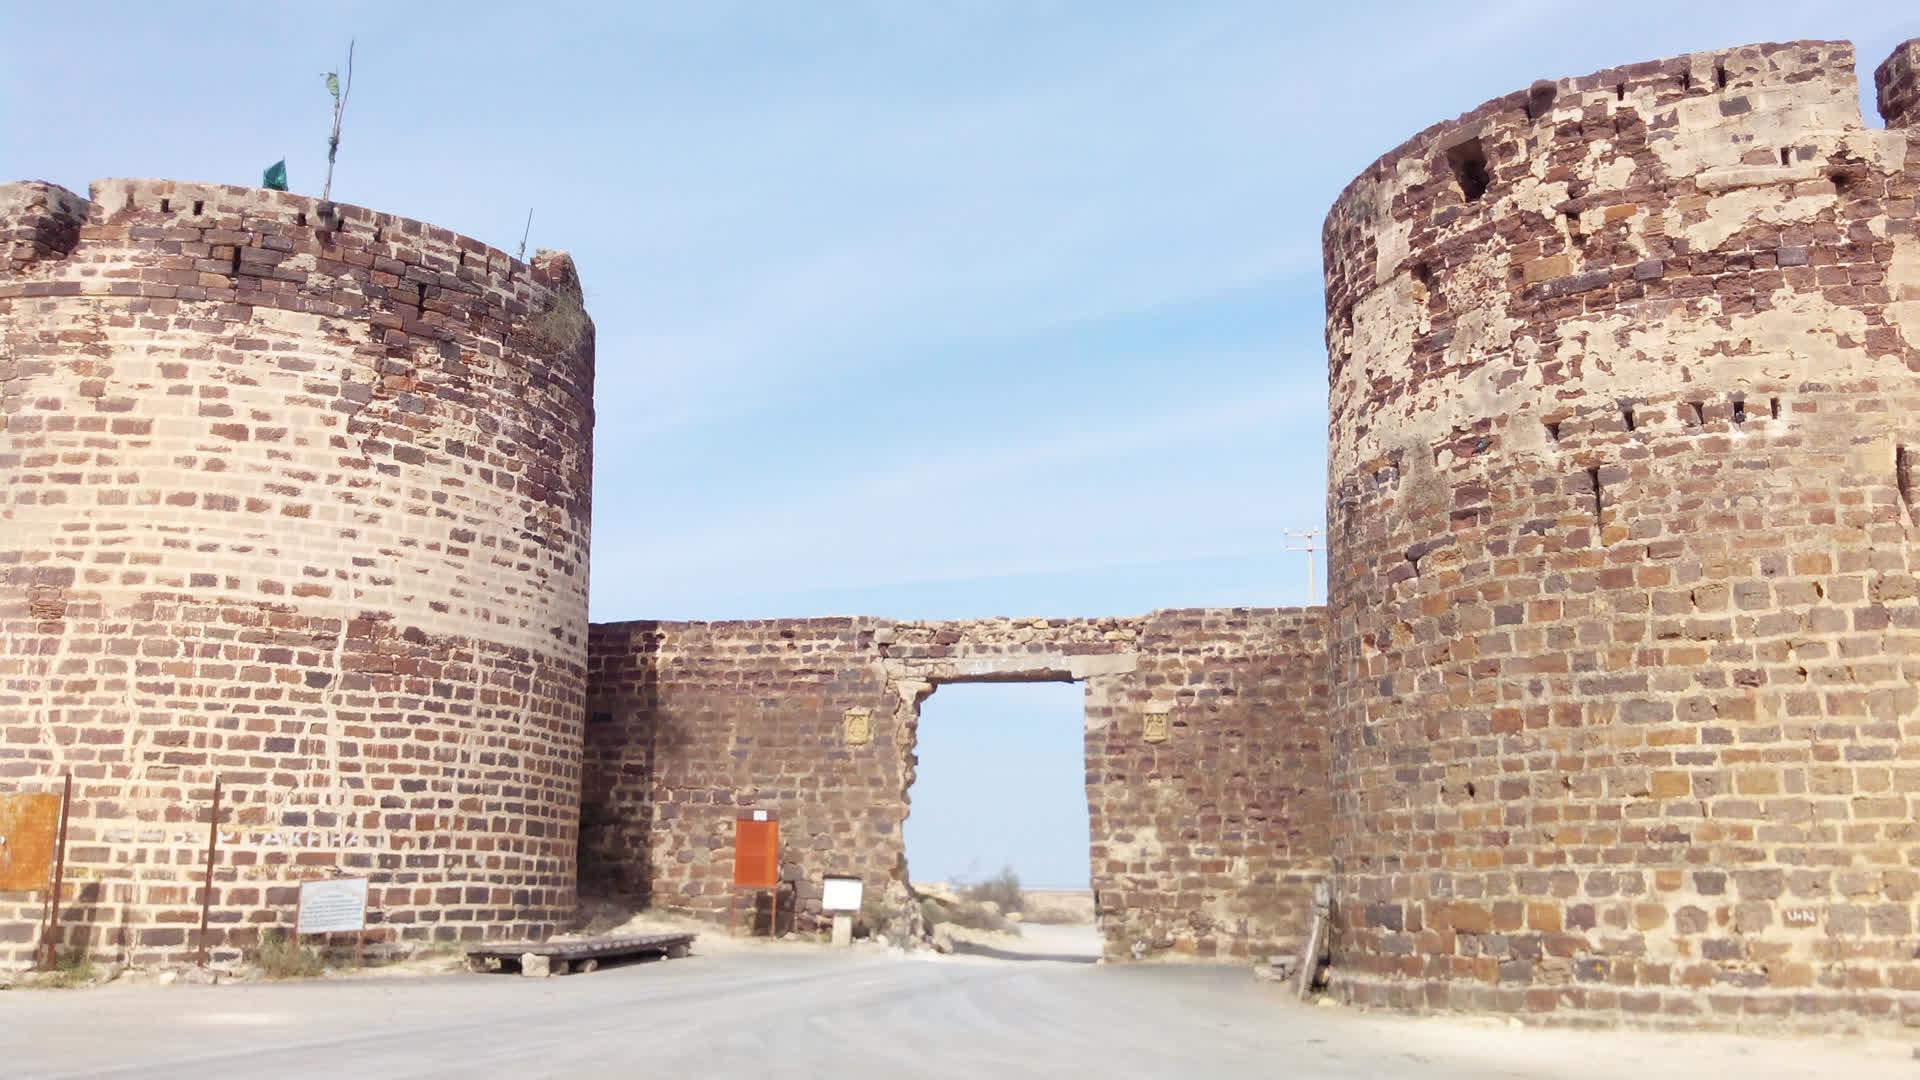 Lakhpat: The Last Bastion